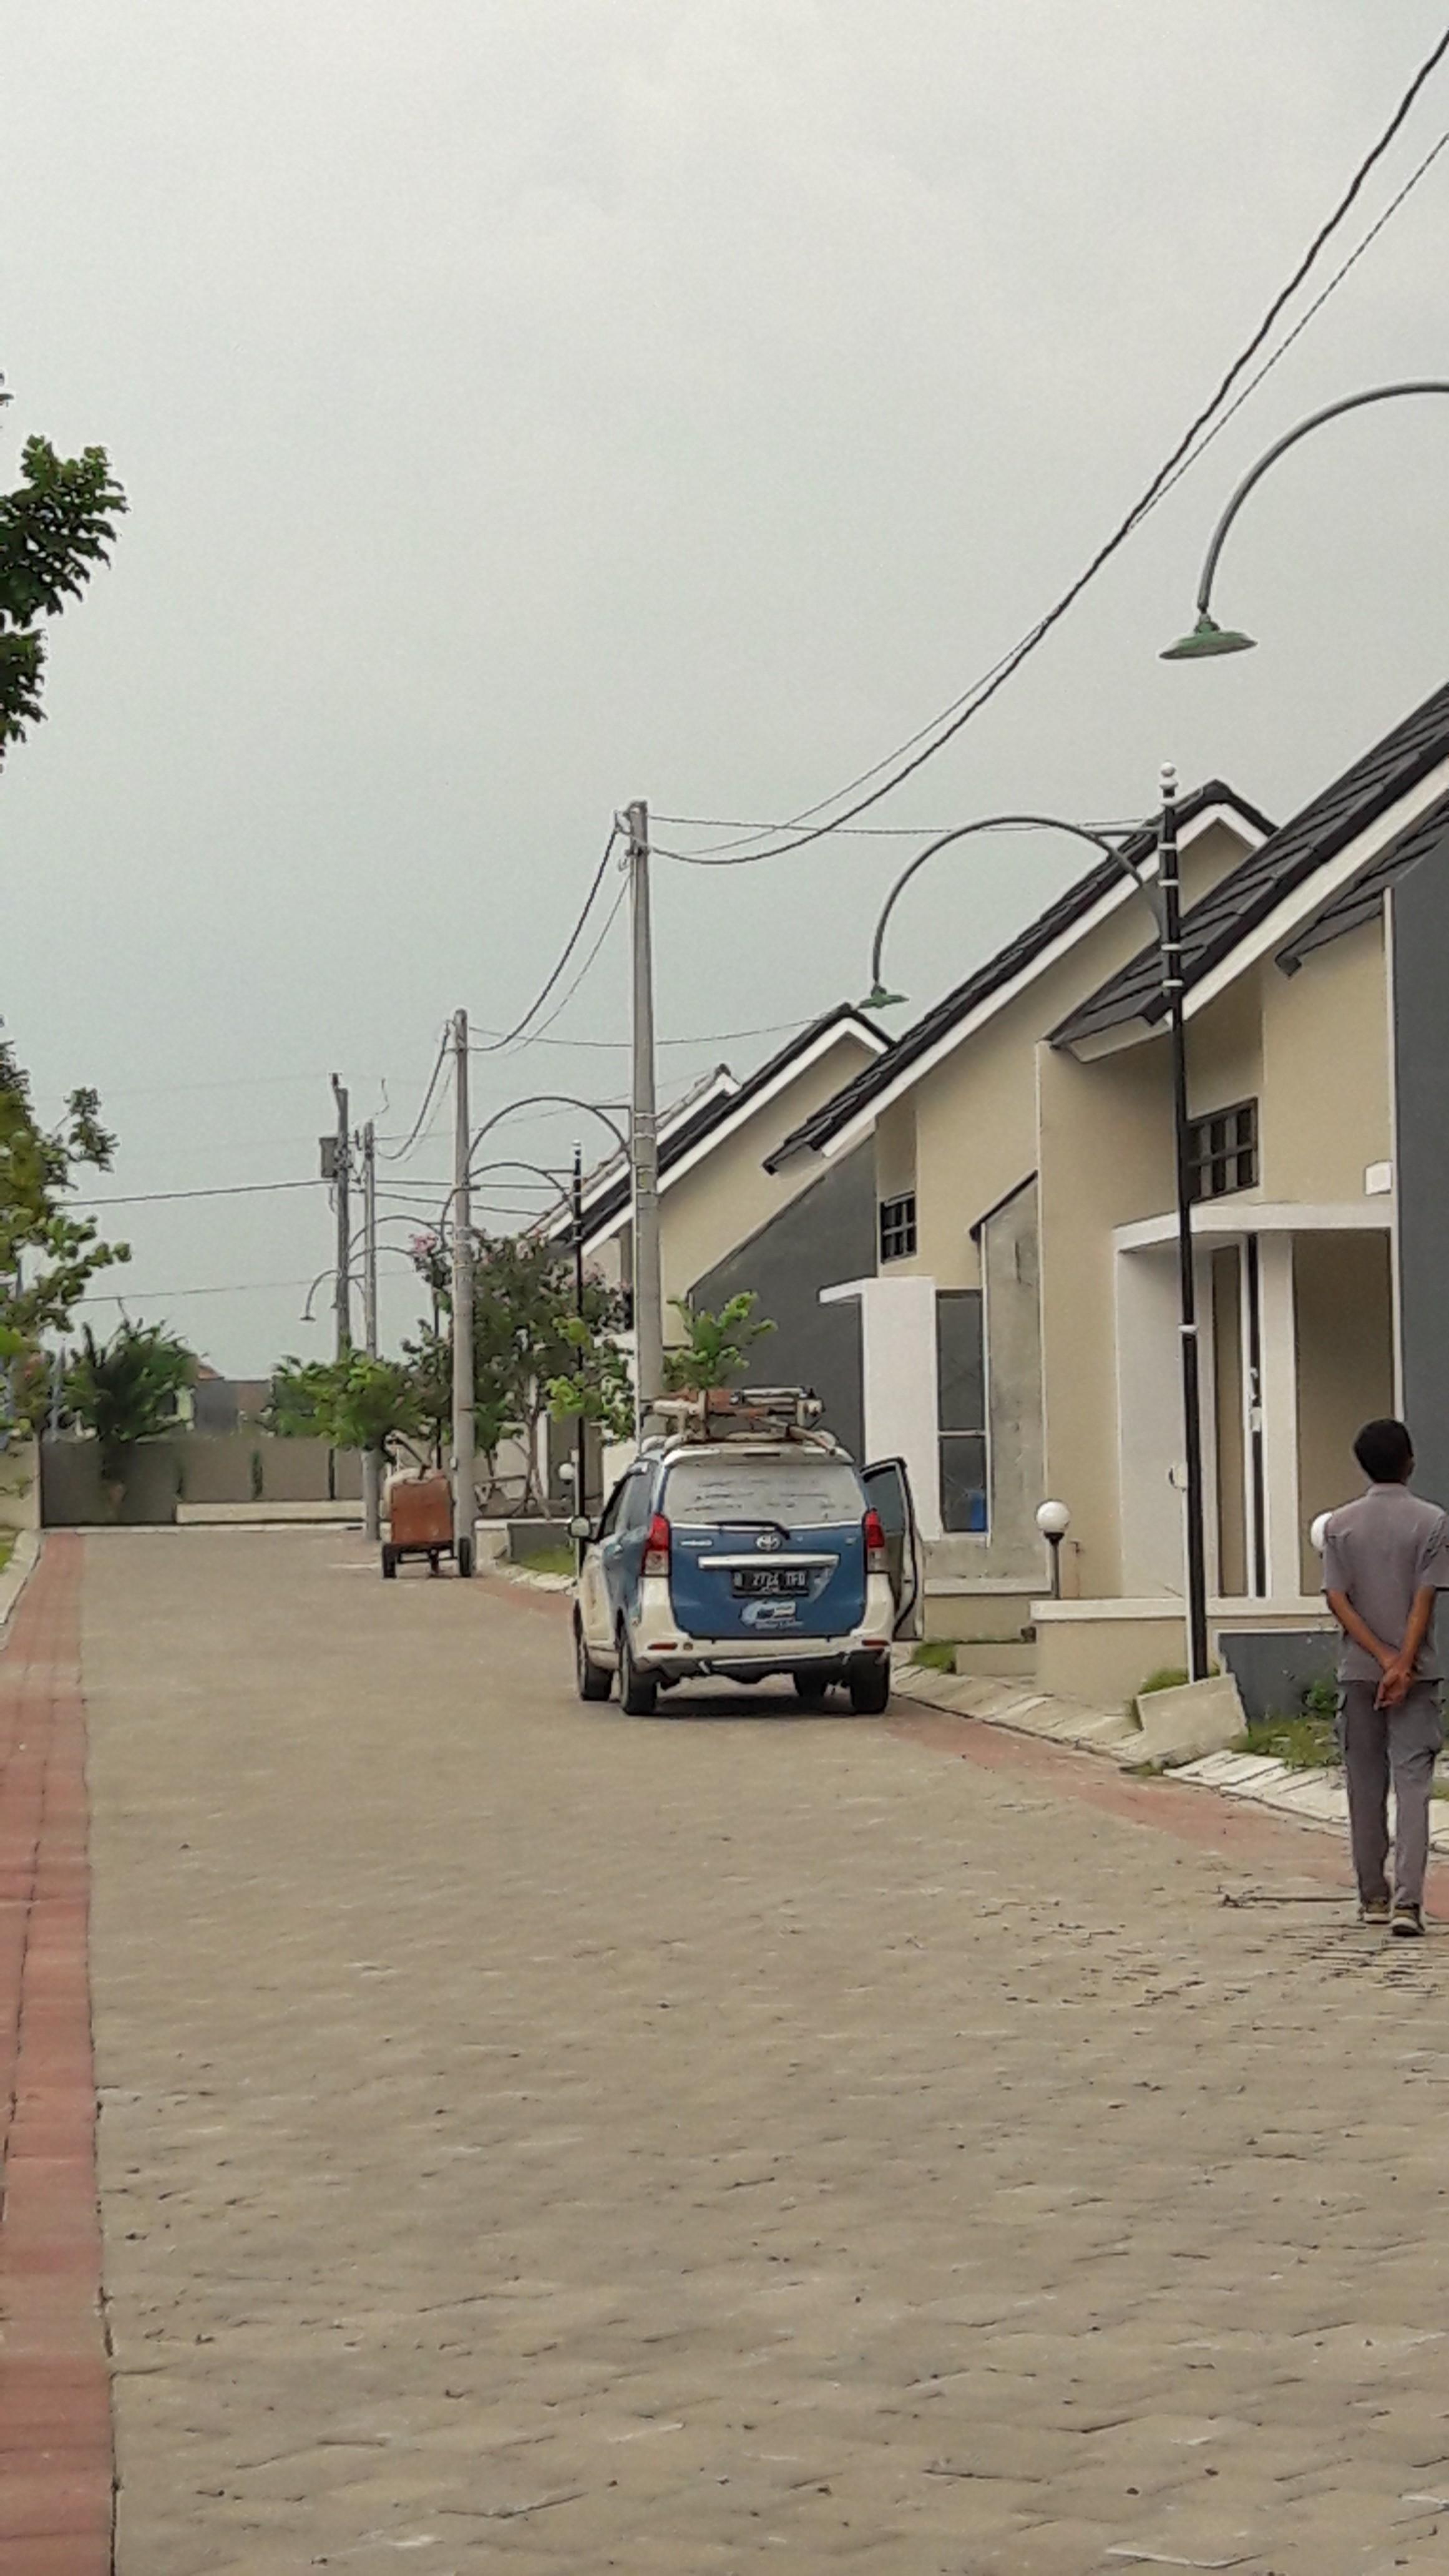 harga atap baja ringan dan genteng beton perumahan di solo : taman kuantan singopuran – ...